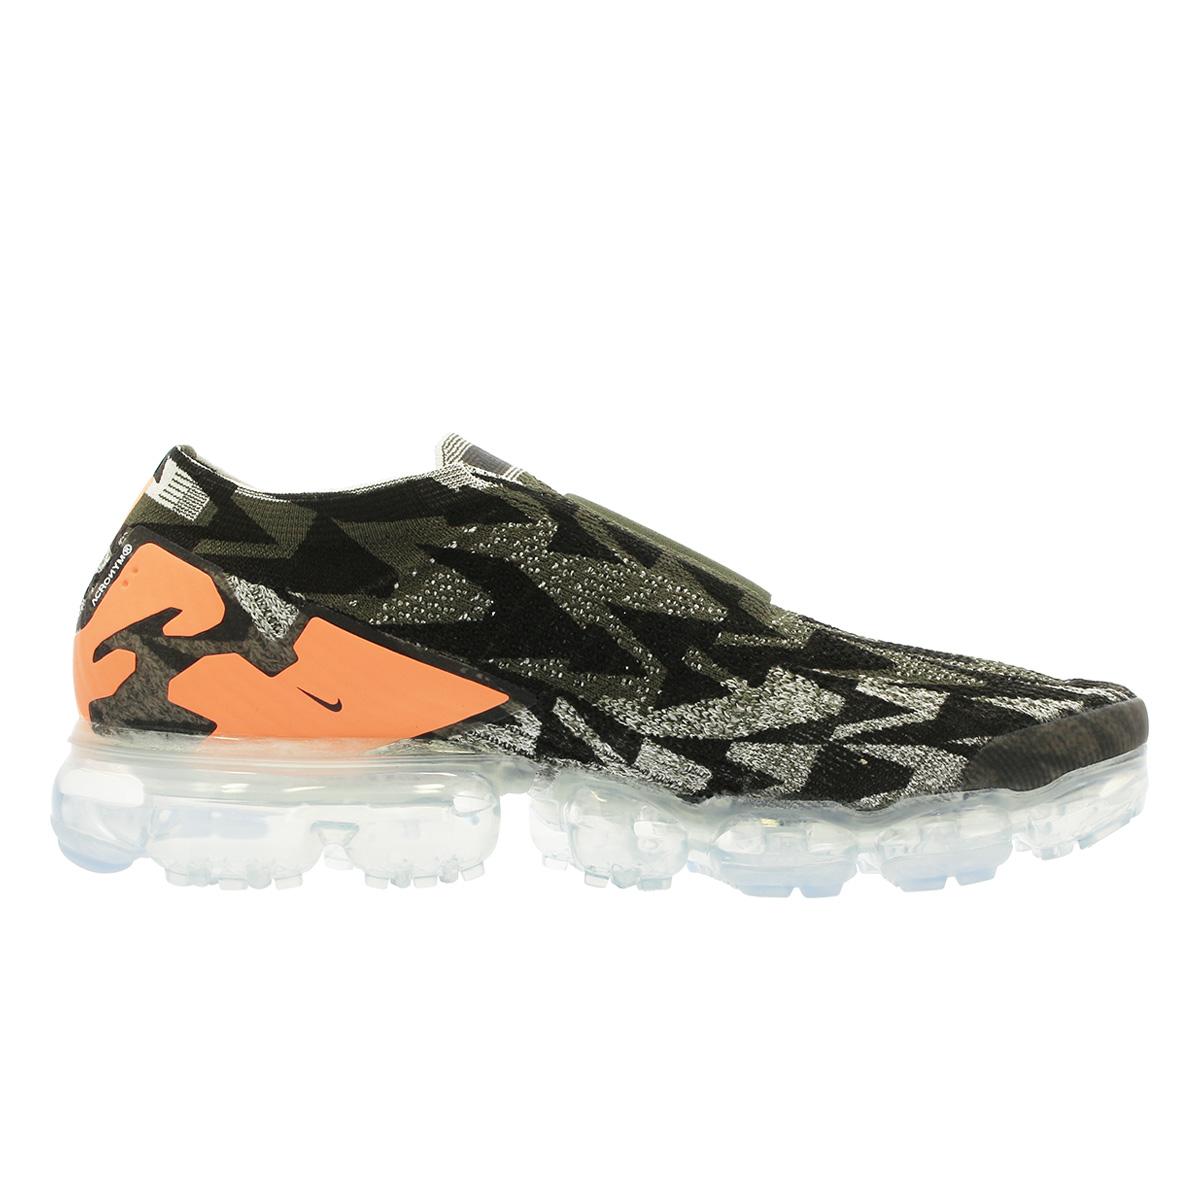 49e84c21dc7b NIKE X ACRONYM AIR VAPORMAX MOC 2 Nike X アクロニウムエアヴェイパーマックスモック 2 SAIL CARGO  KHAKI DARK STUCCO aq0996-102